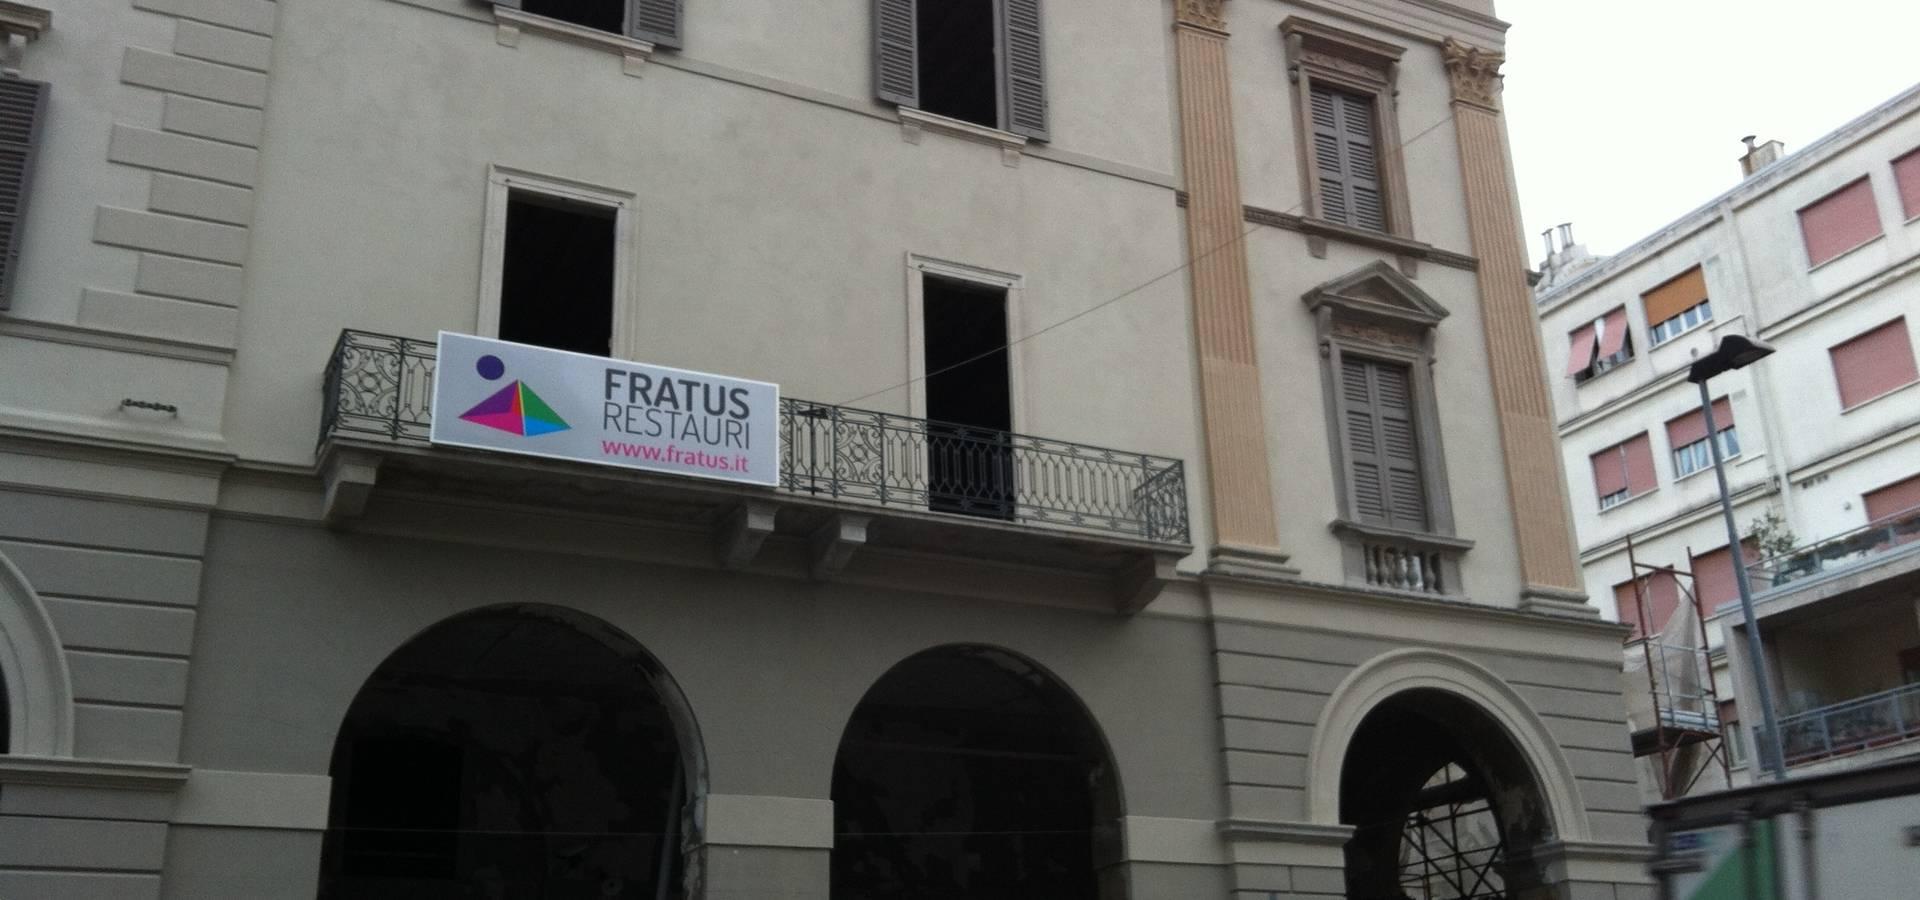 Fratus Restauri Srl